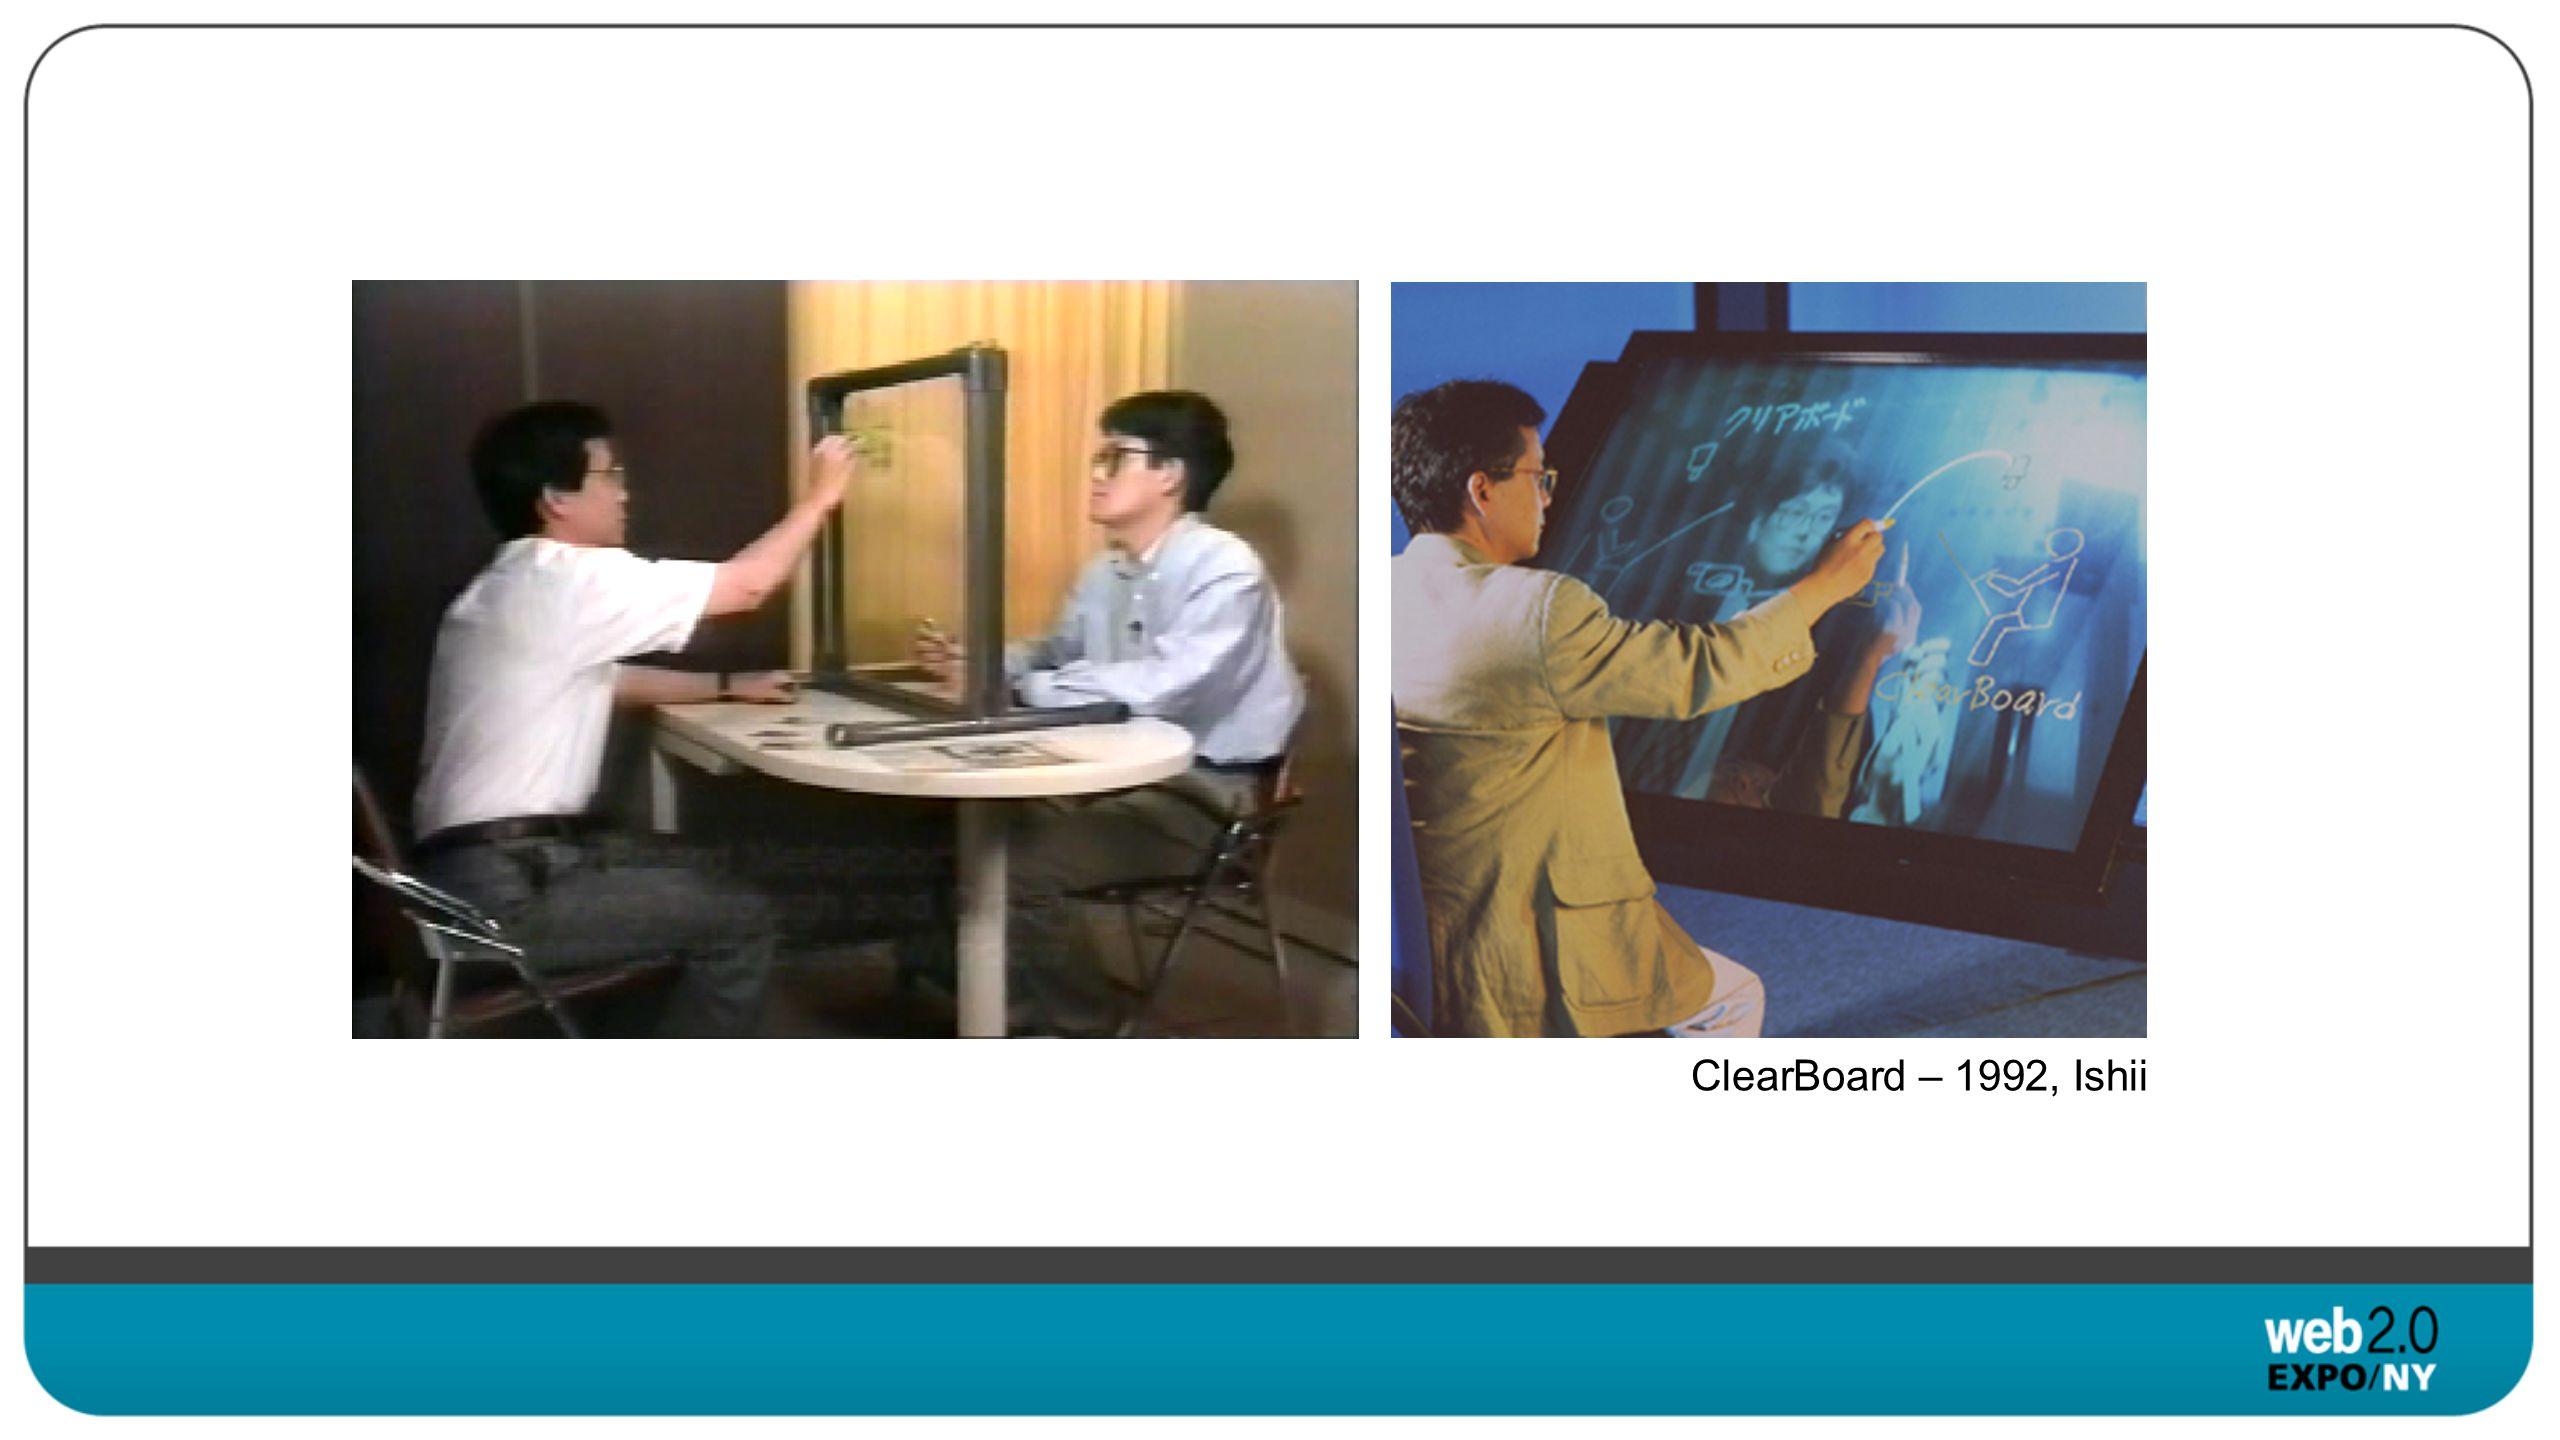 ClearBoard – 1992, Ishii